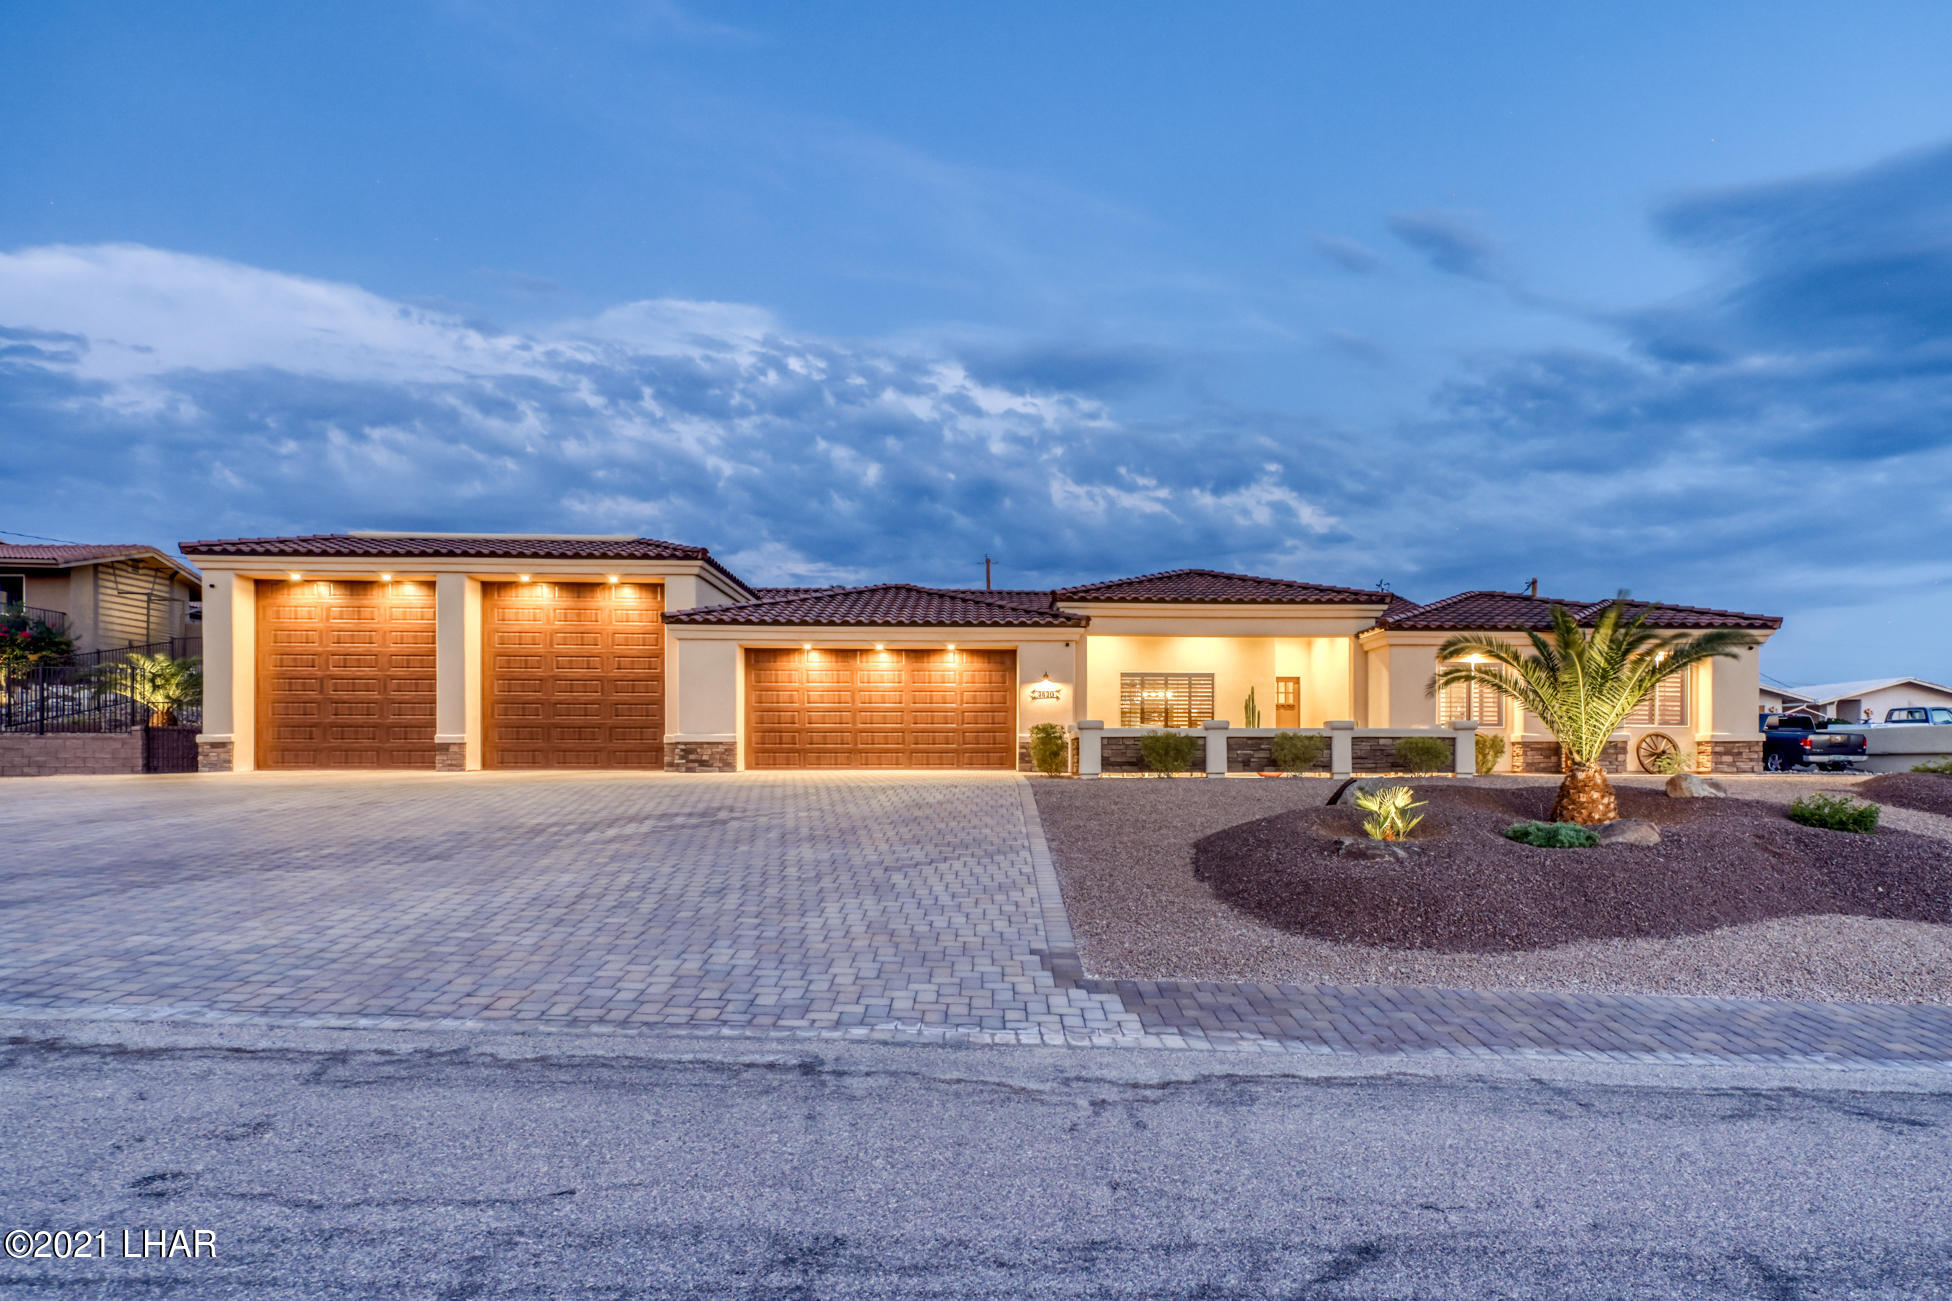 Photo of 3820 Texoma Dr, Lake Havasu City, AZ 86404